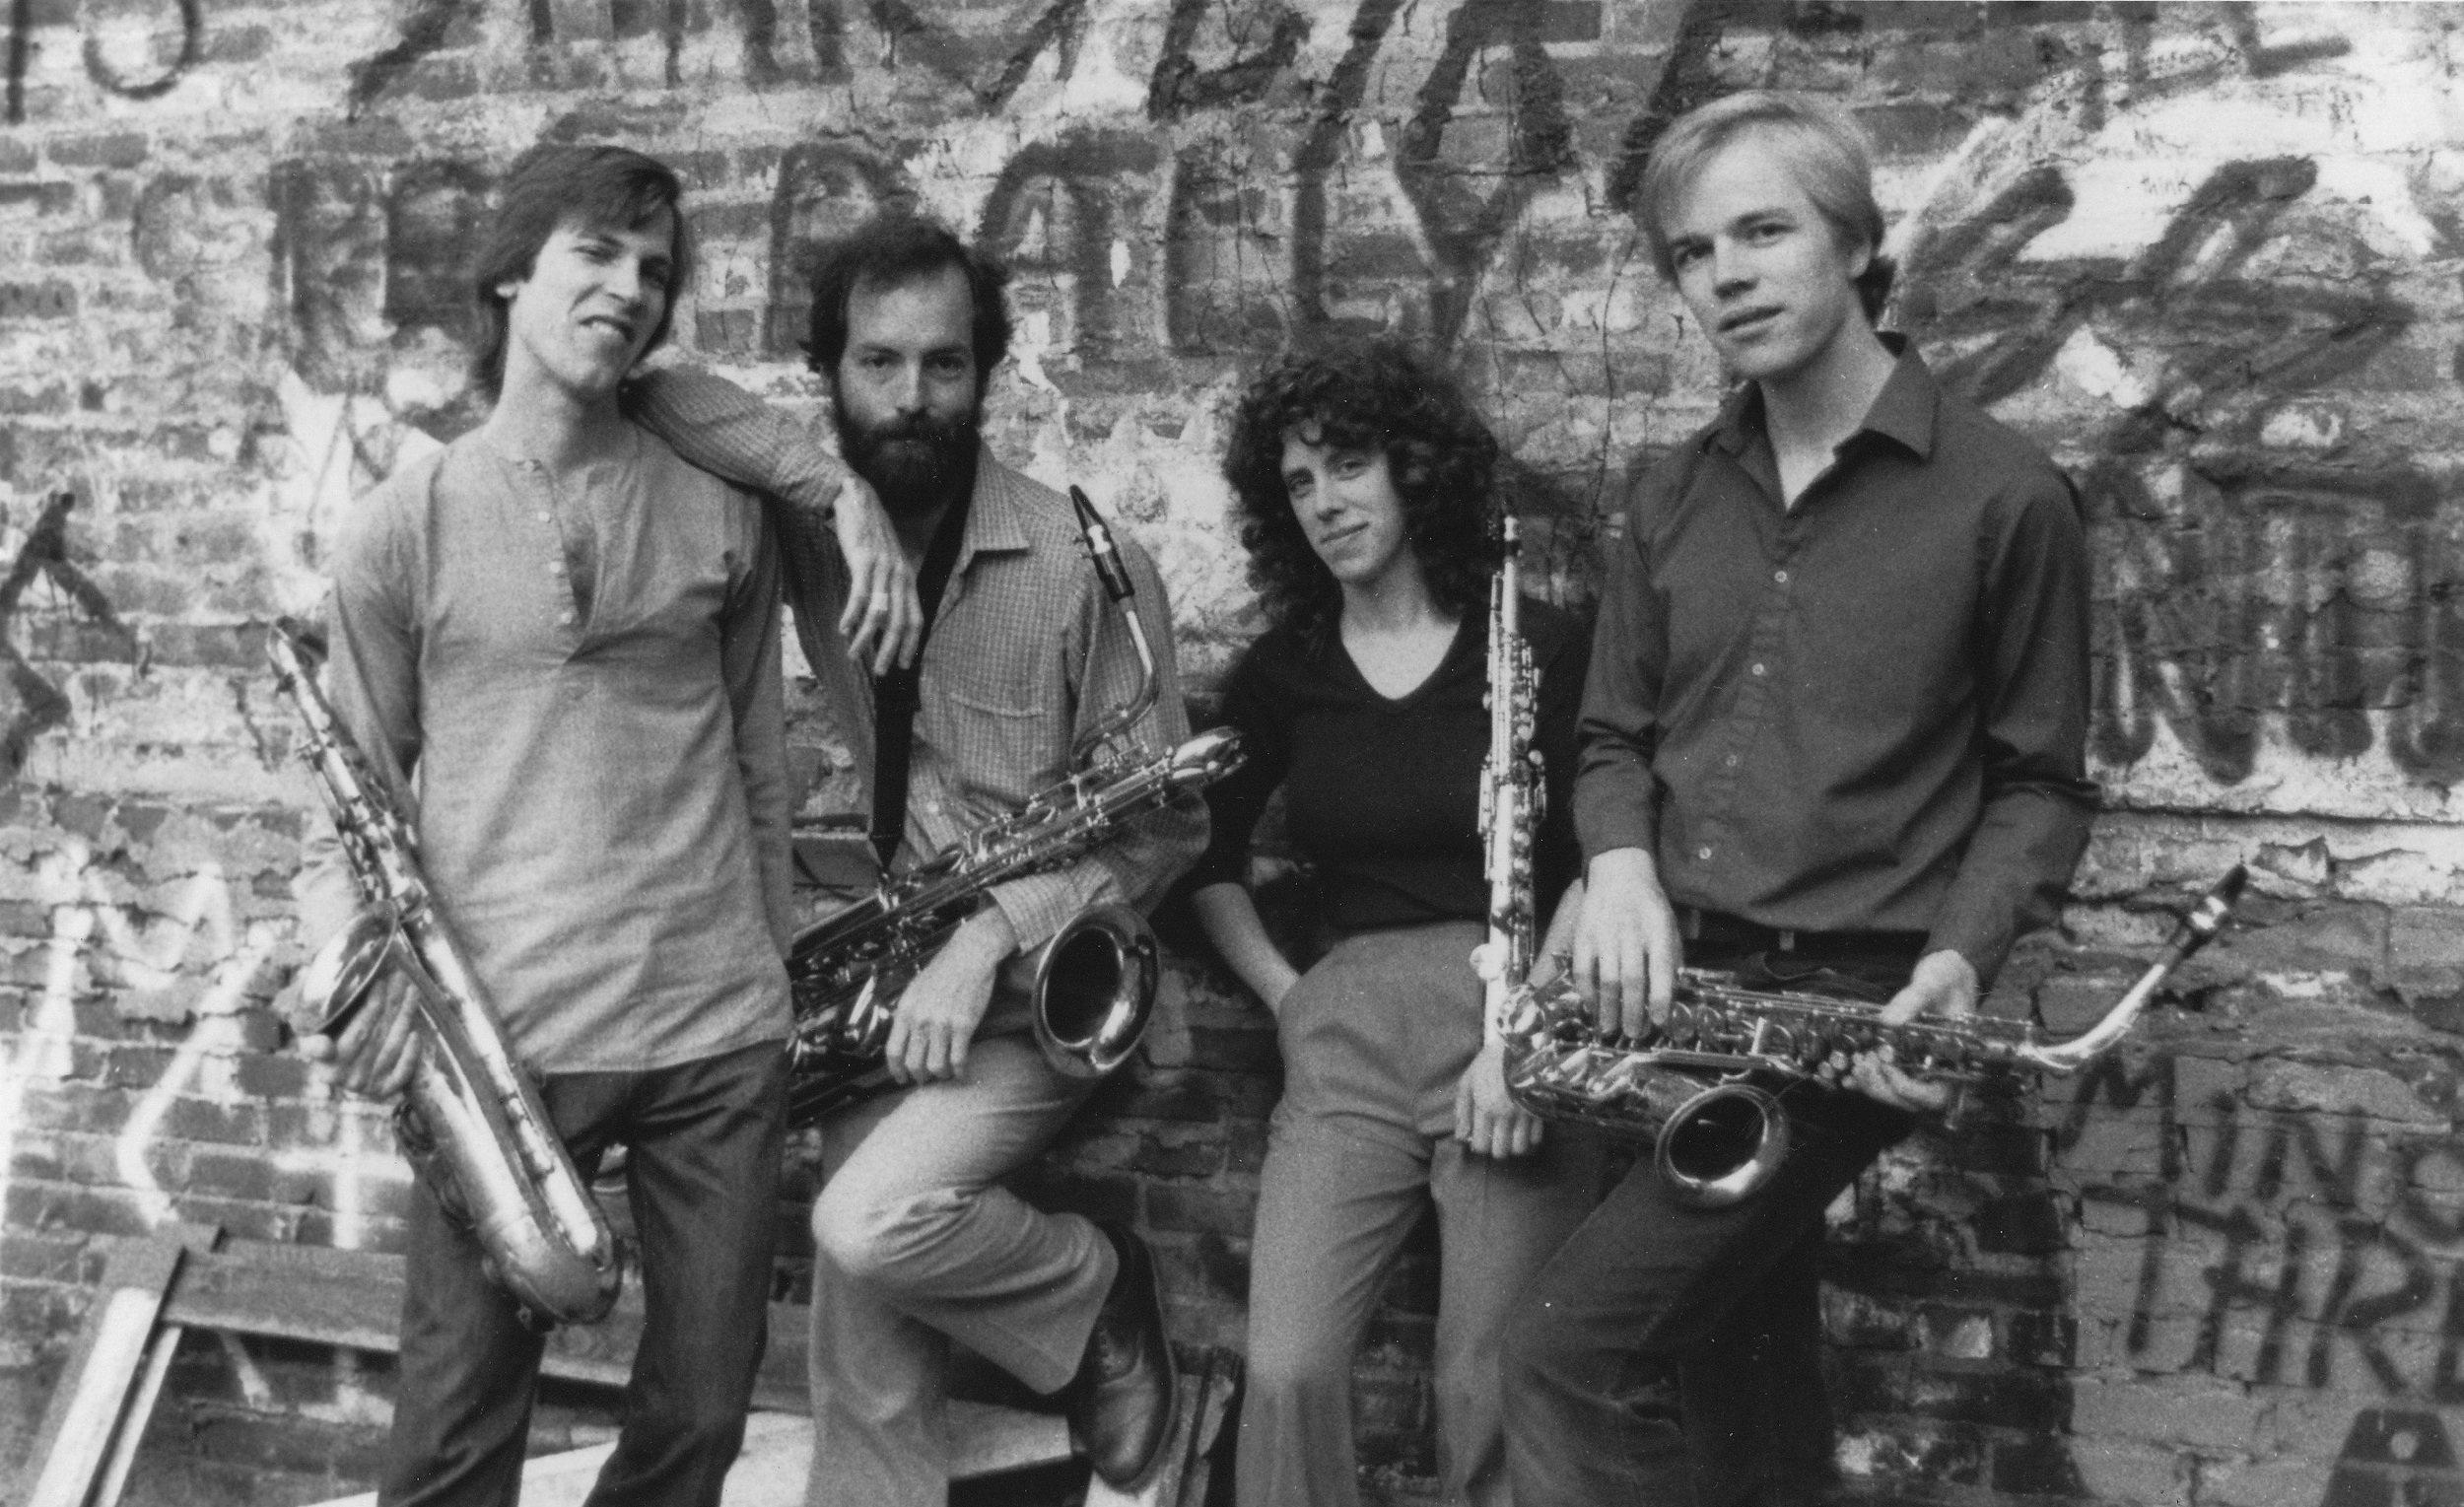 L to R: Tom Hall, Steve Adams, Cercie Miller, Allan Chase, near Gallery East, Boston, 1982.